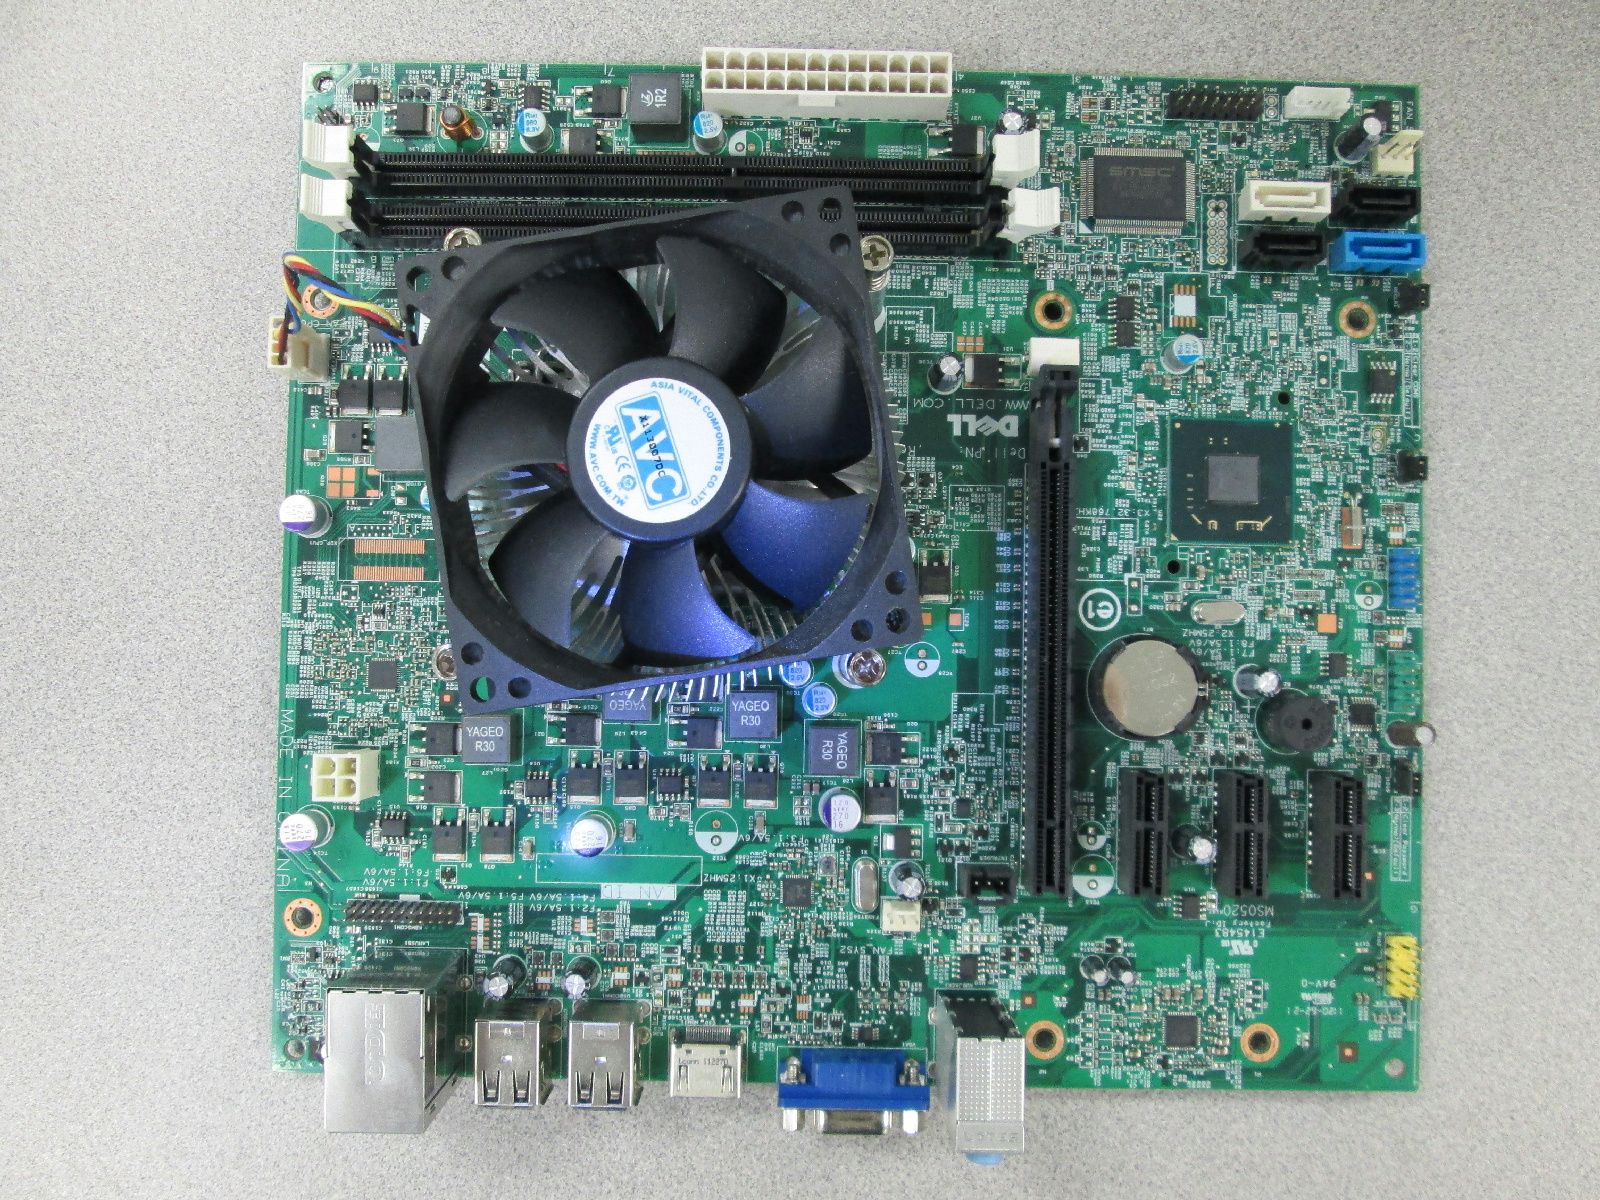 MIH61R-MB Micro-ATX Motherboard LGA1155 | eBay